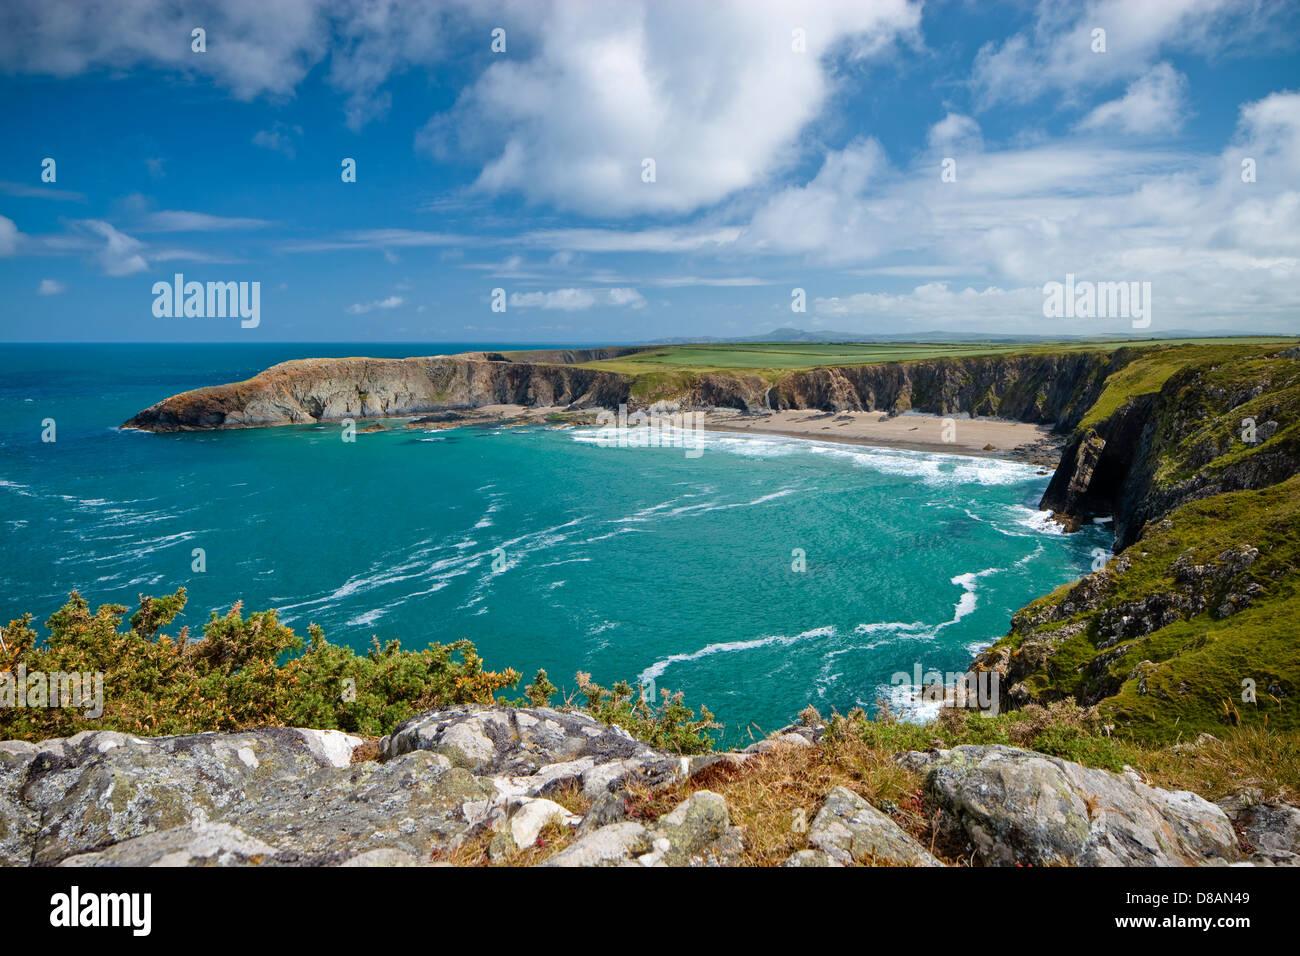 Chemin de la côte en arrière-plan Llyfn avec Traeth Abereiddy Saint Davids, Pembrokeshire Wales Photo Stock